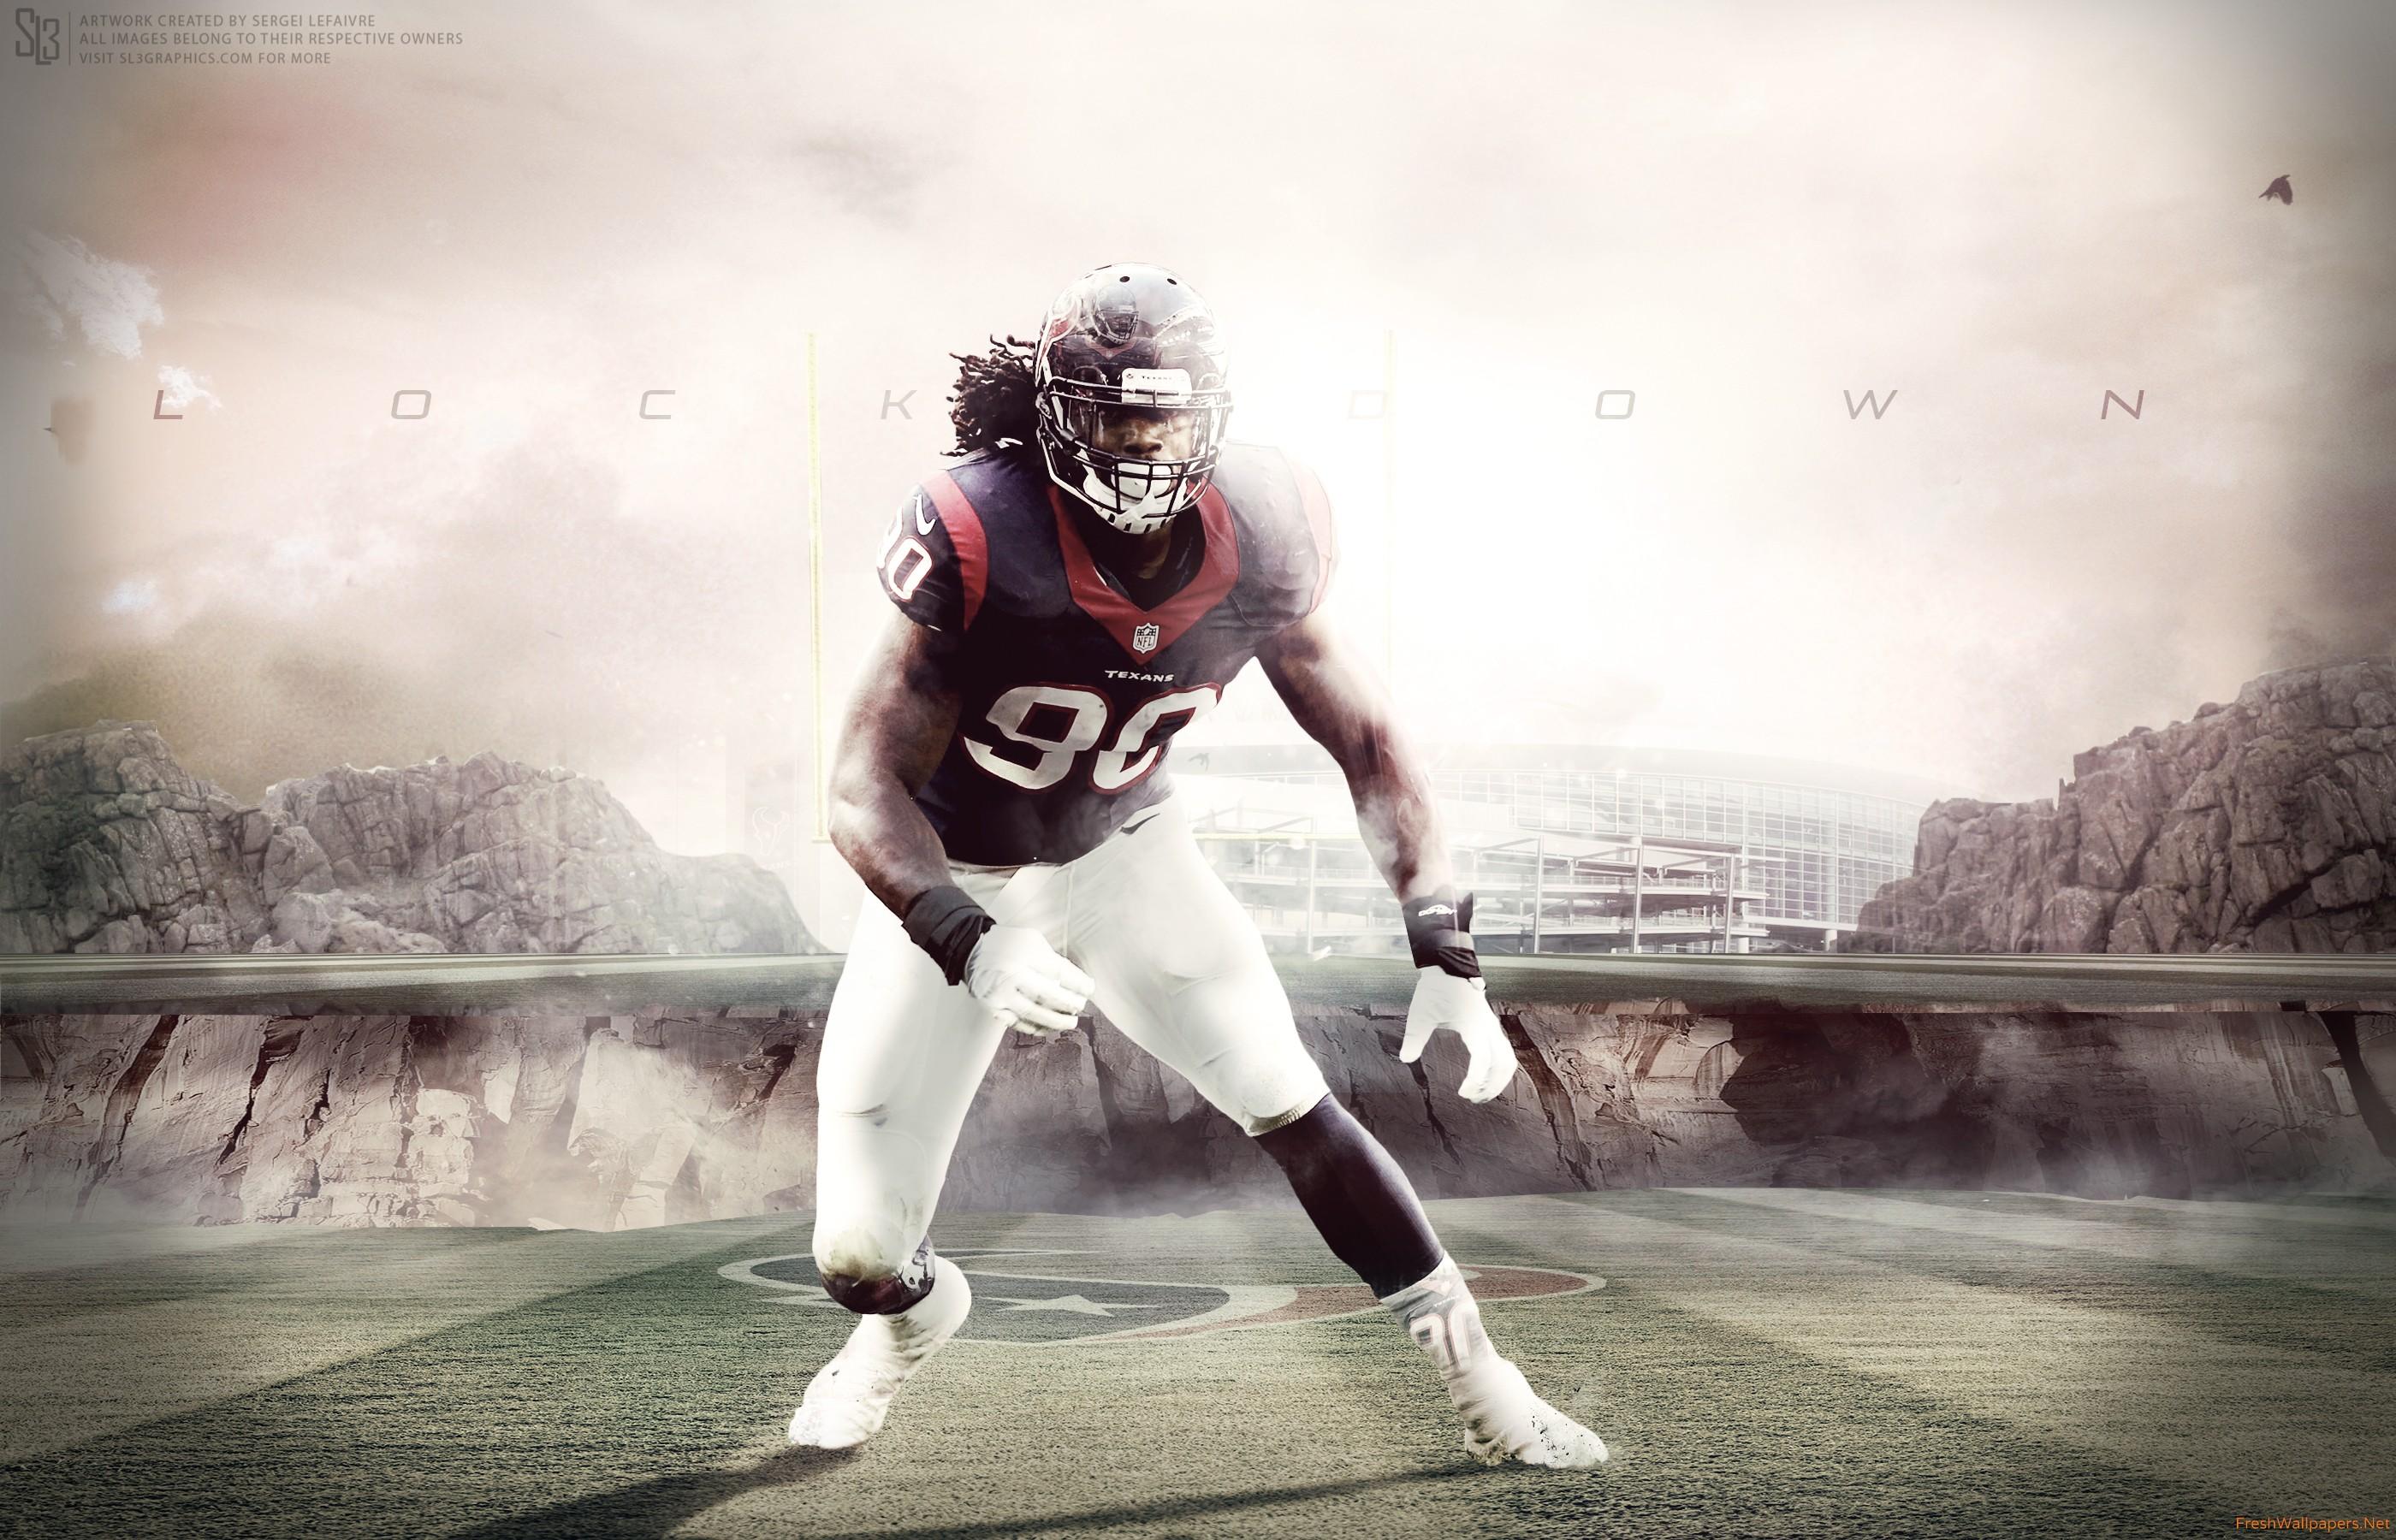 Jadeveon Clowney 2015 Houston Texans NFL wallpapers 2800x1800